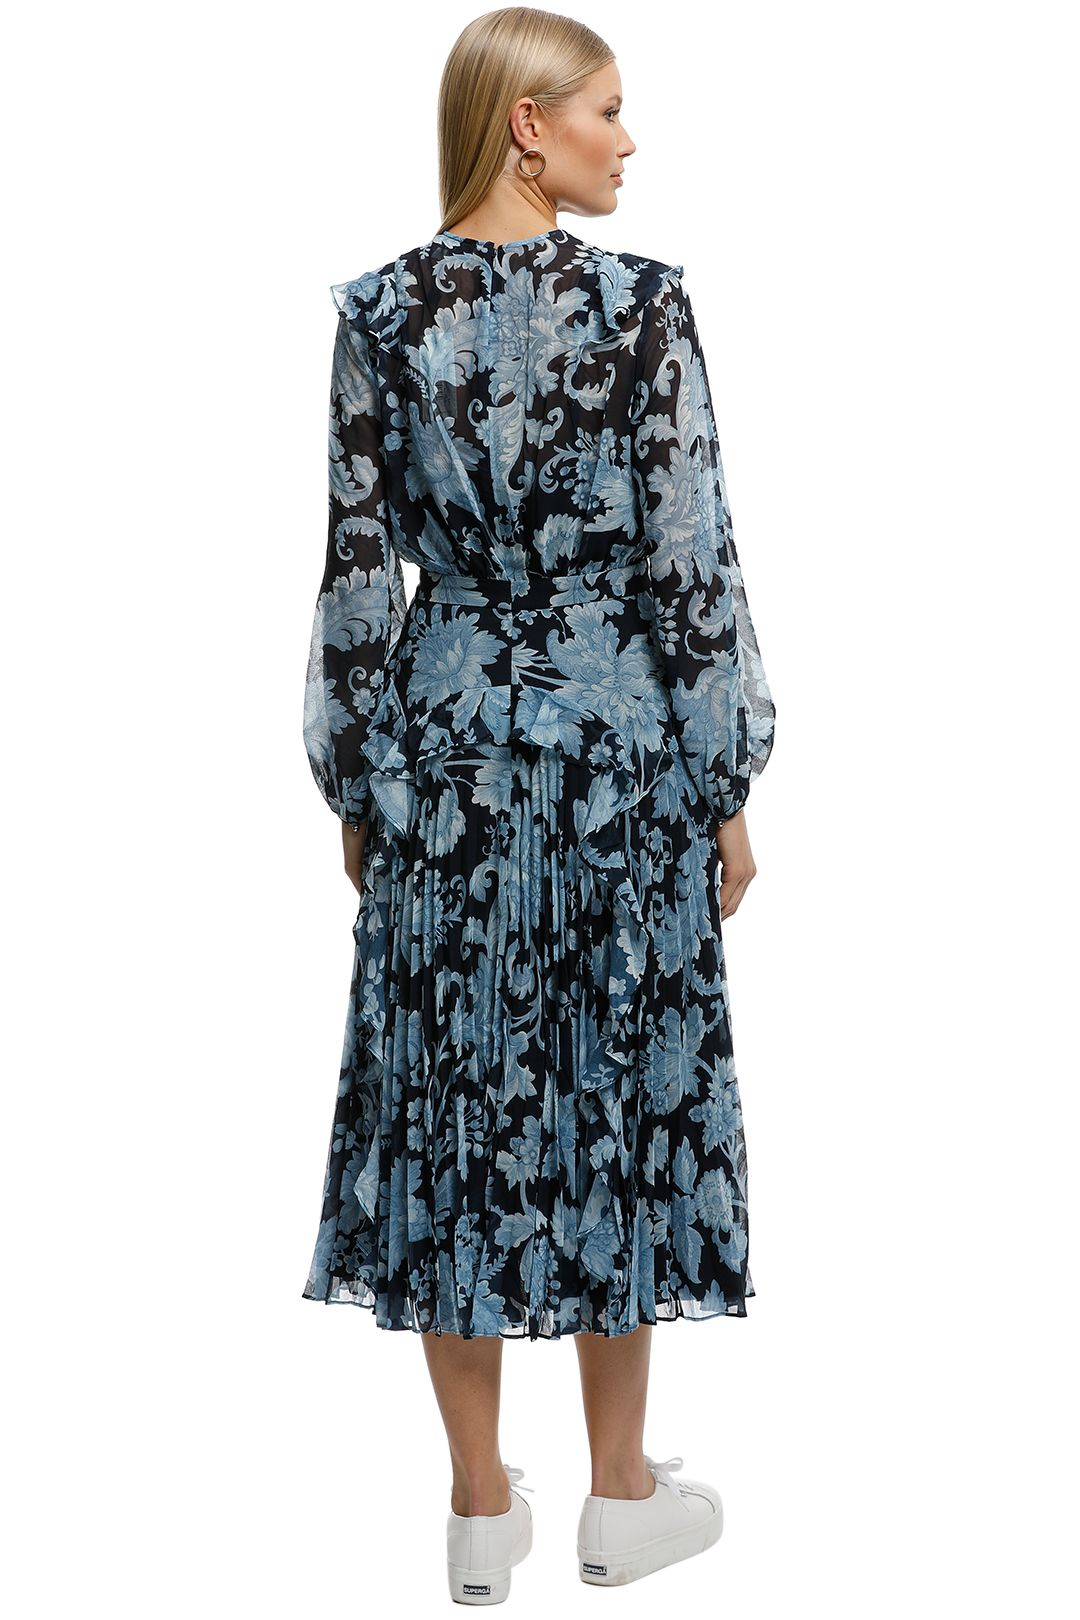 Lover-Florence Pleat Midi Dress-Navy-Back